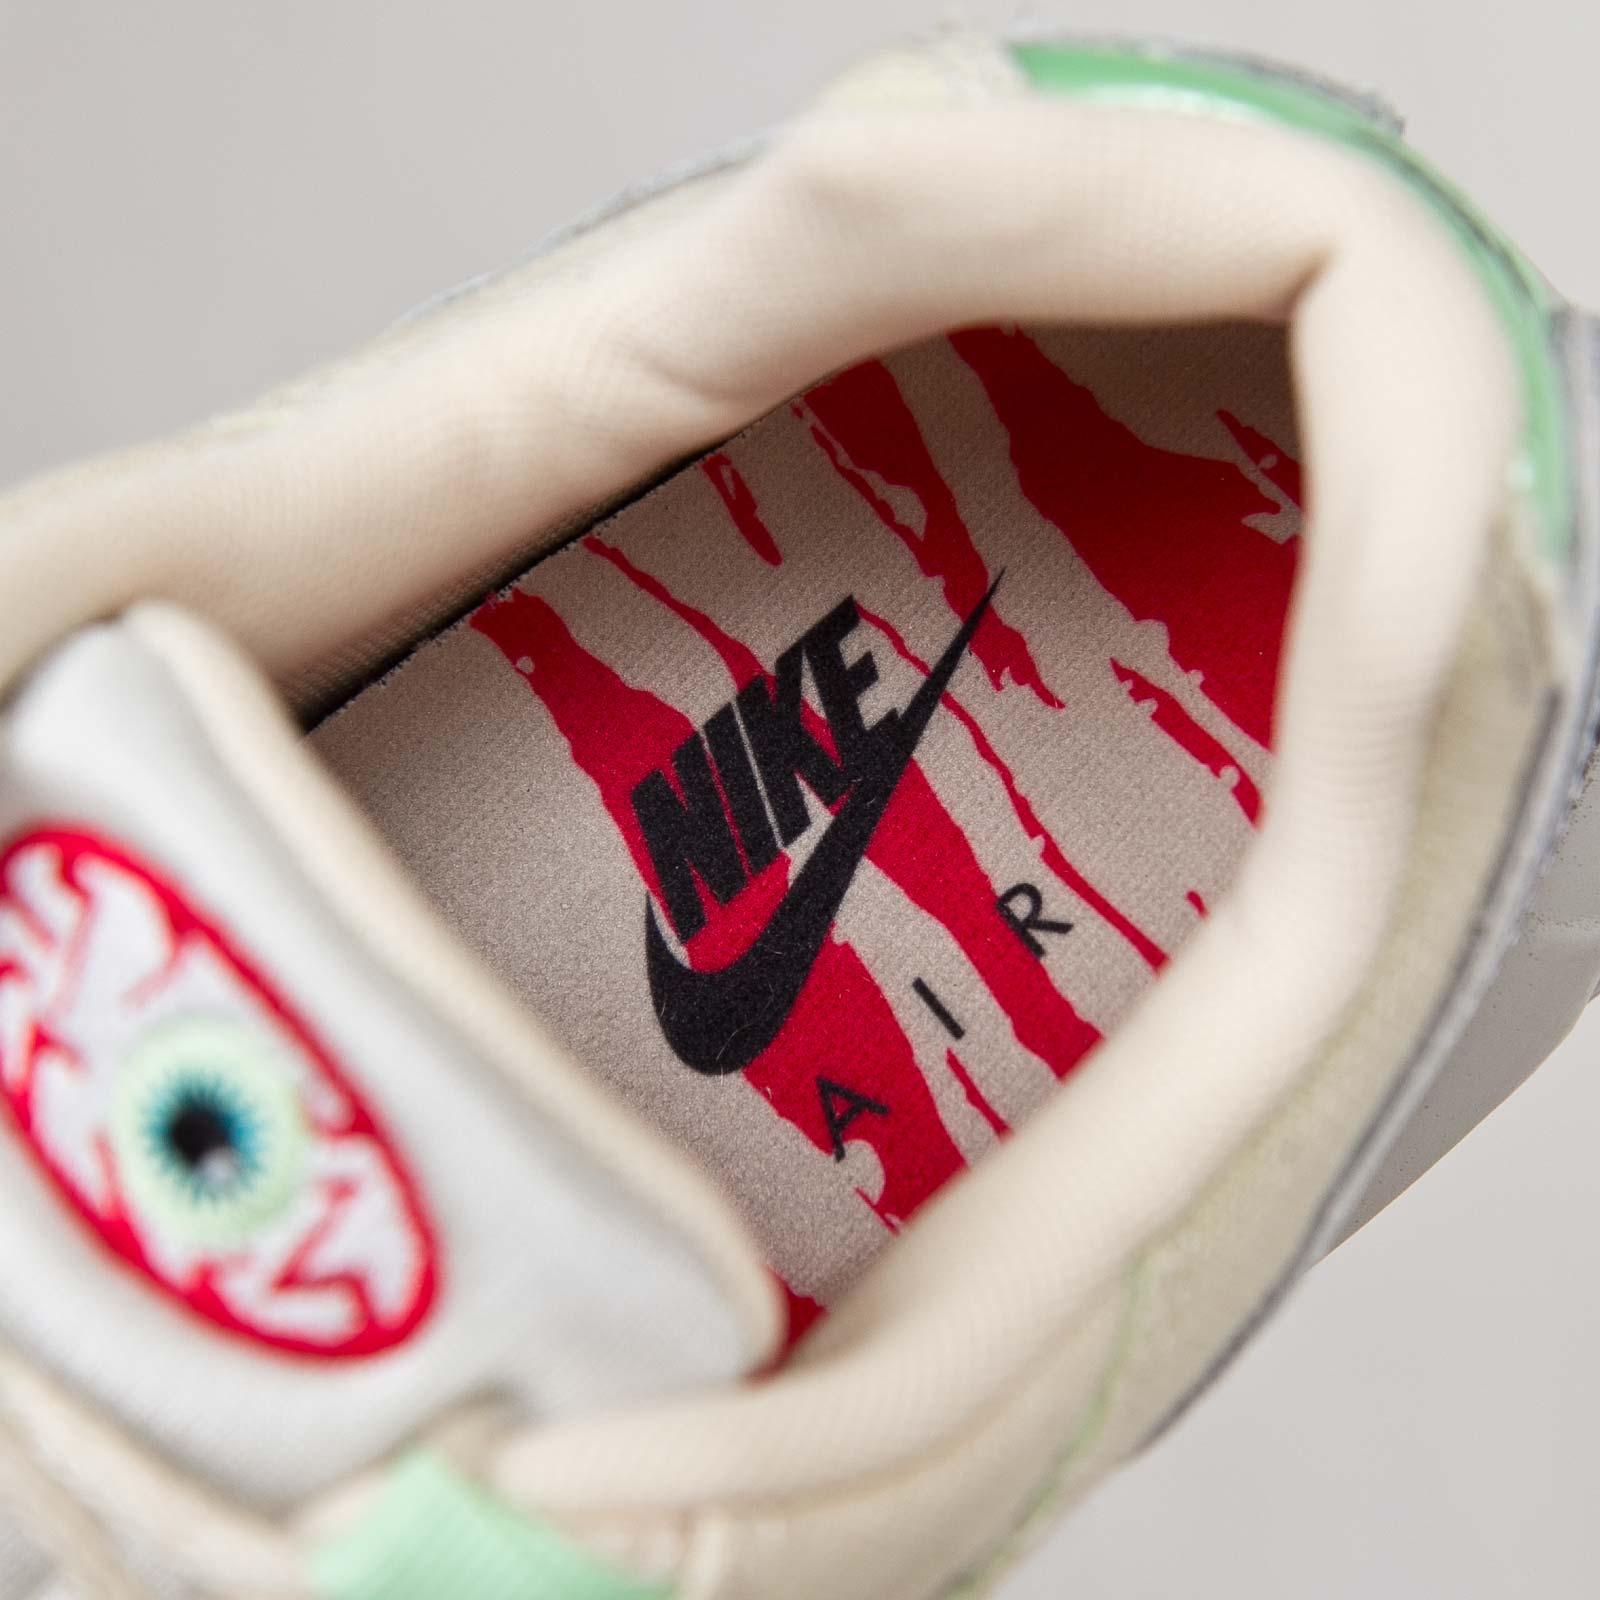 Nike Air Max 95 Halloween QS 717599 100 Sneakersnstuff